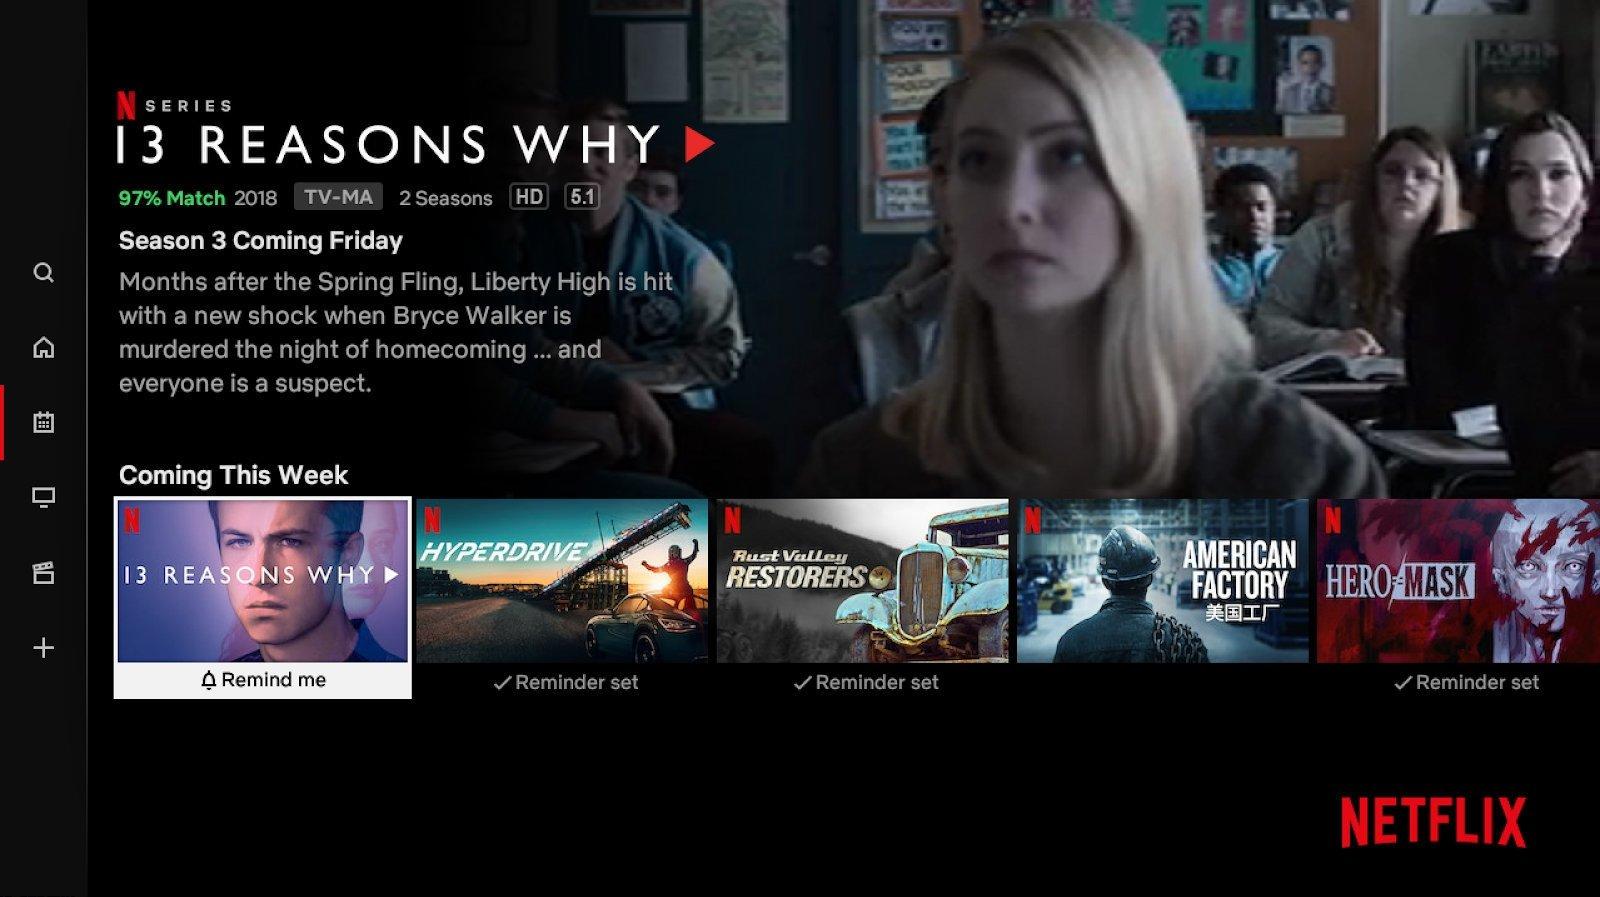 reminder set Netflix